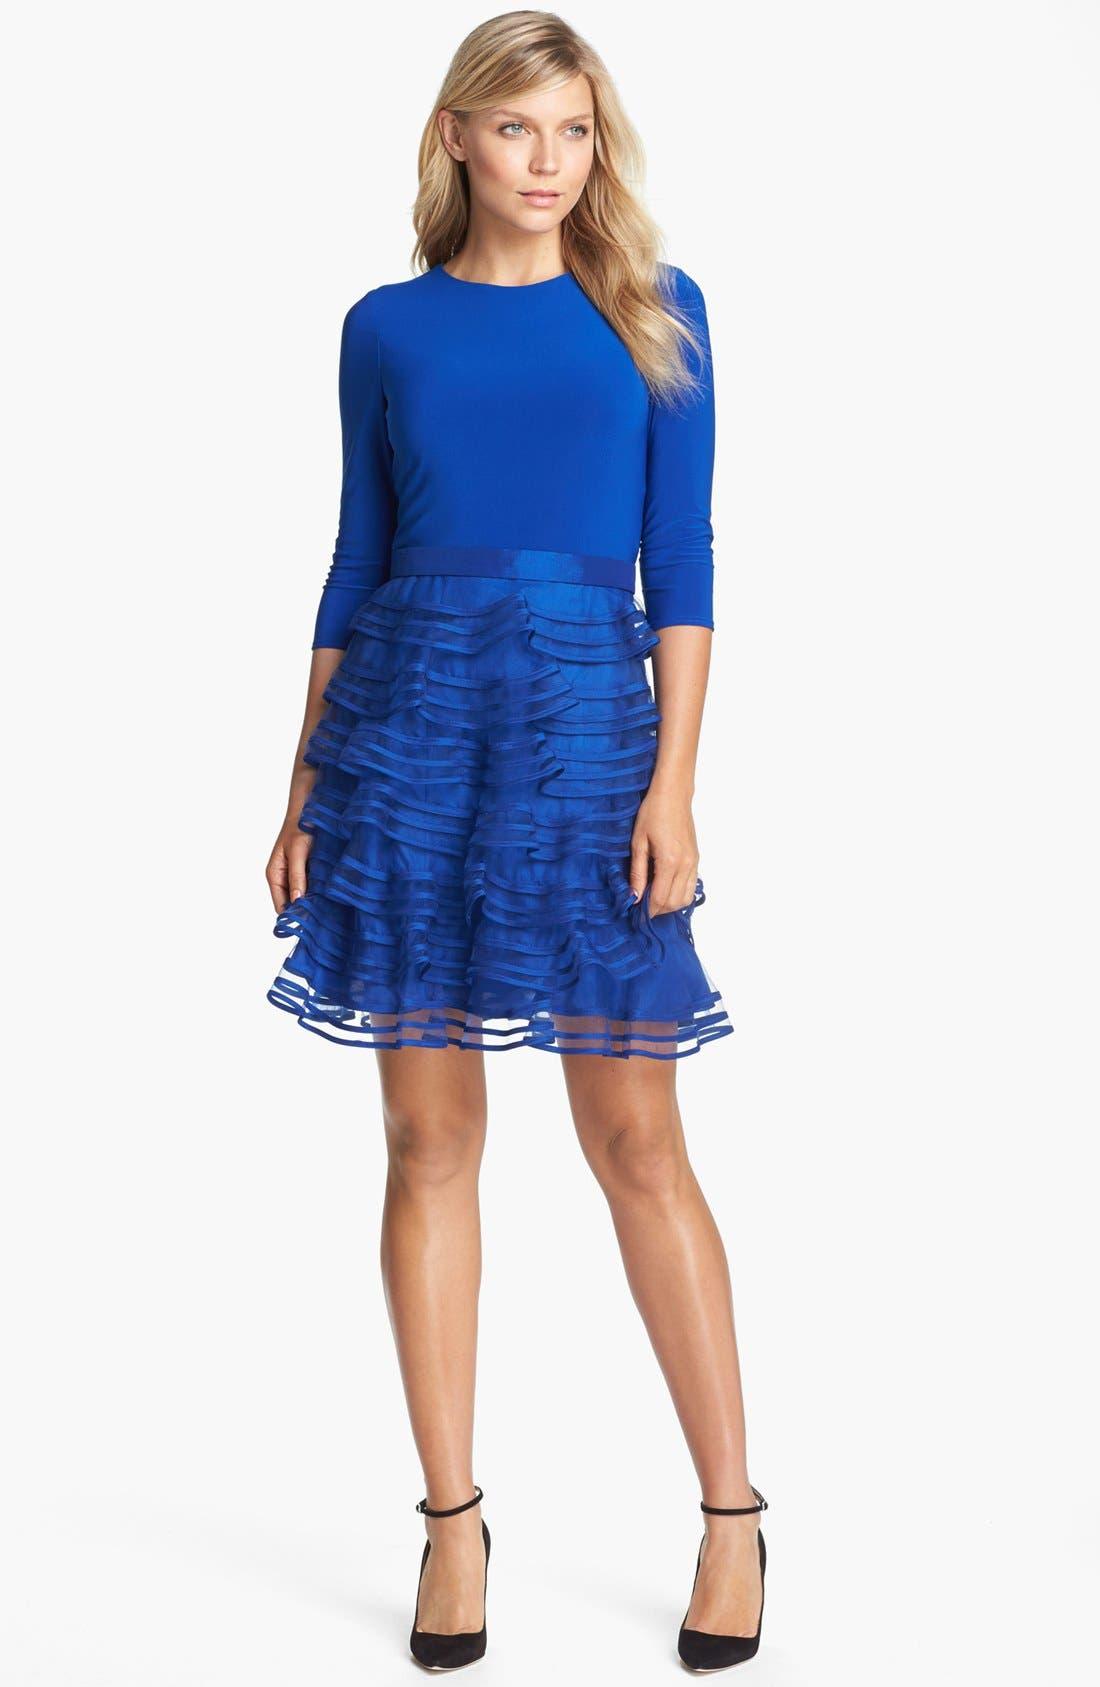 Main Image - Kathy Hilton Tiered Skirt Mixed Media Dress